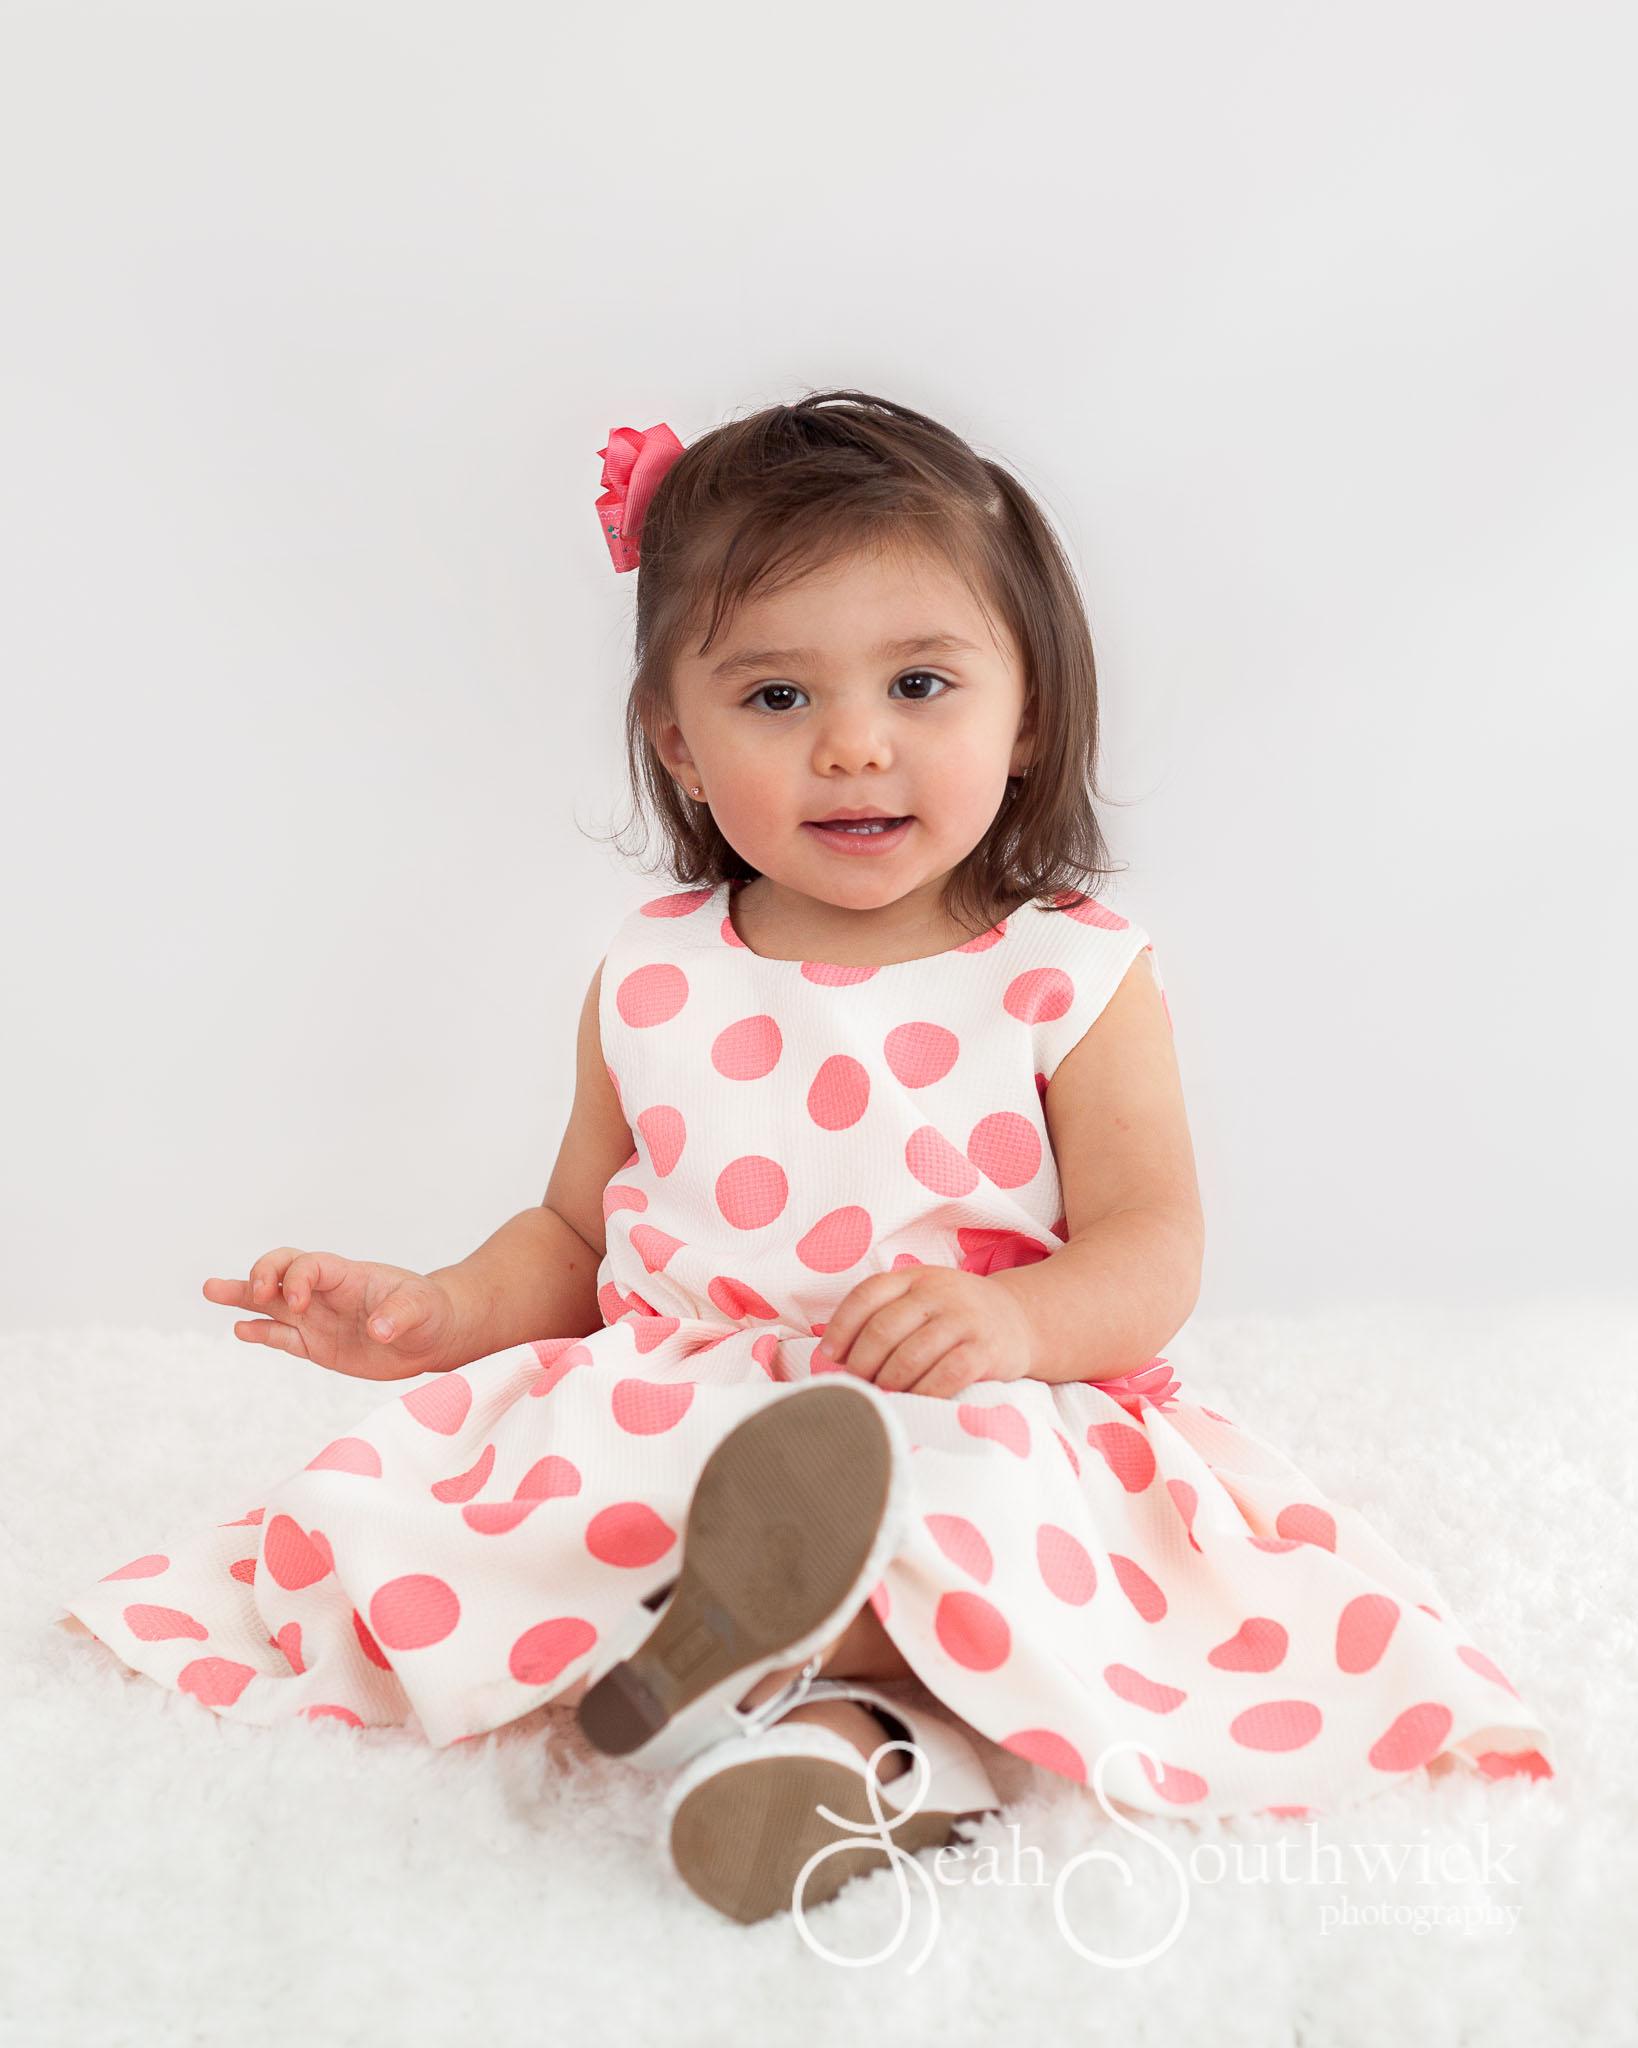 Child and Family Photography_Boise Idaho_Leah Southwick Photography-2.jpg